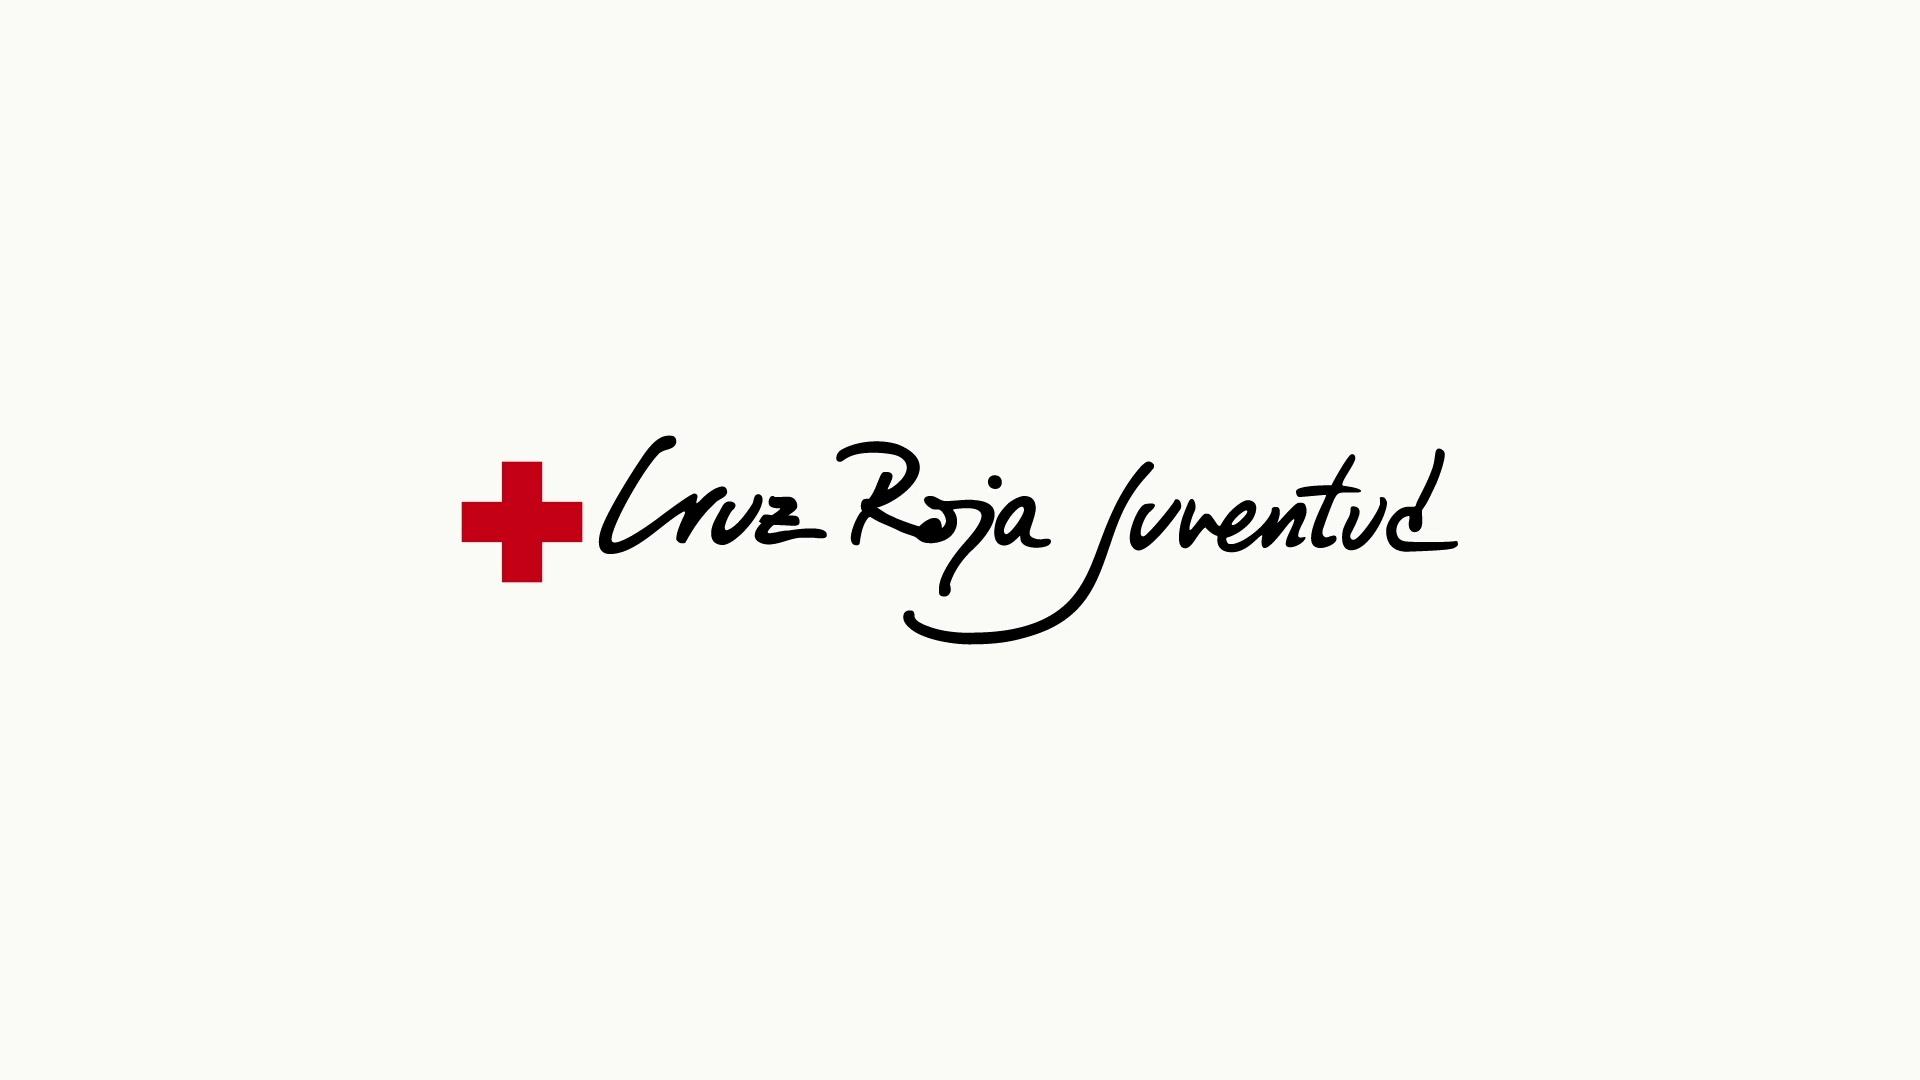 ficcion-Cruz Roja - Concurso 8M